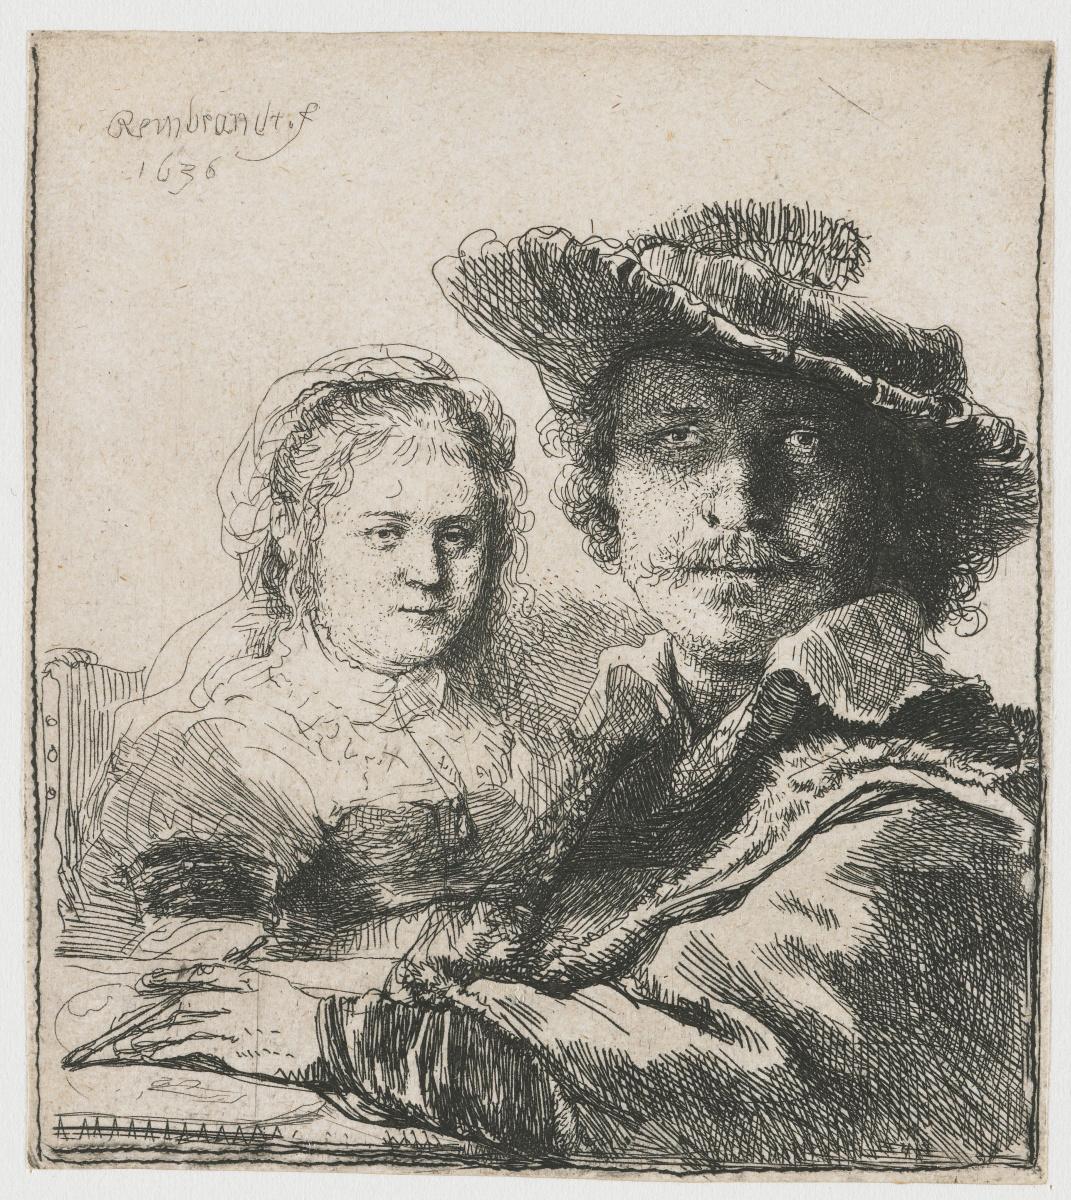 Rembrandt Harmenszoon van Rijn. Self-portrait with Saskia